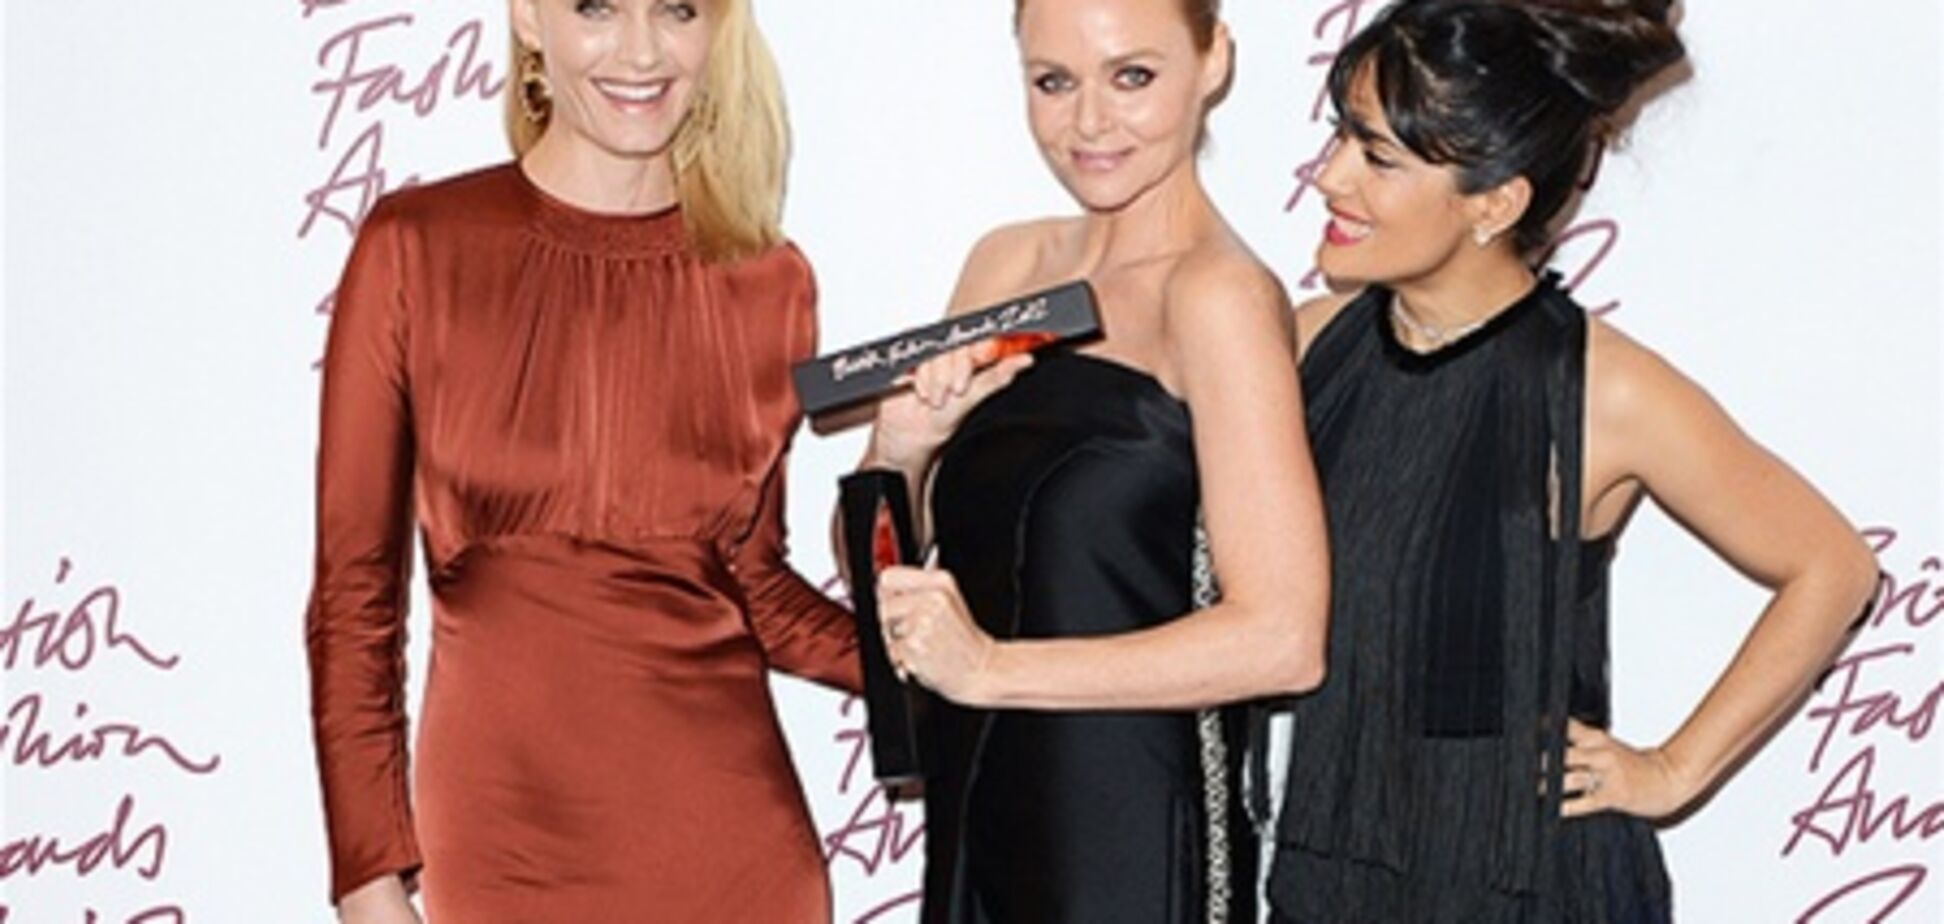 Звезды разобрали награды British Fashion Awards-2012. Фото